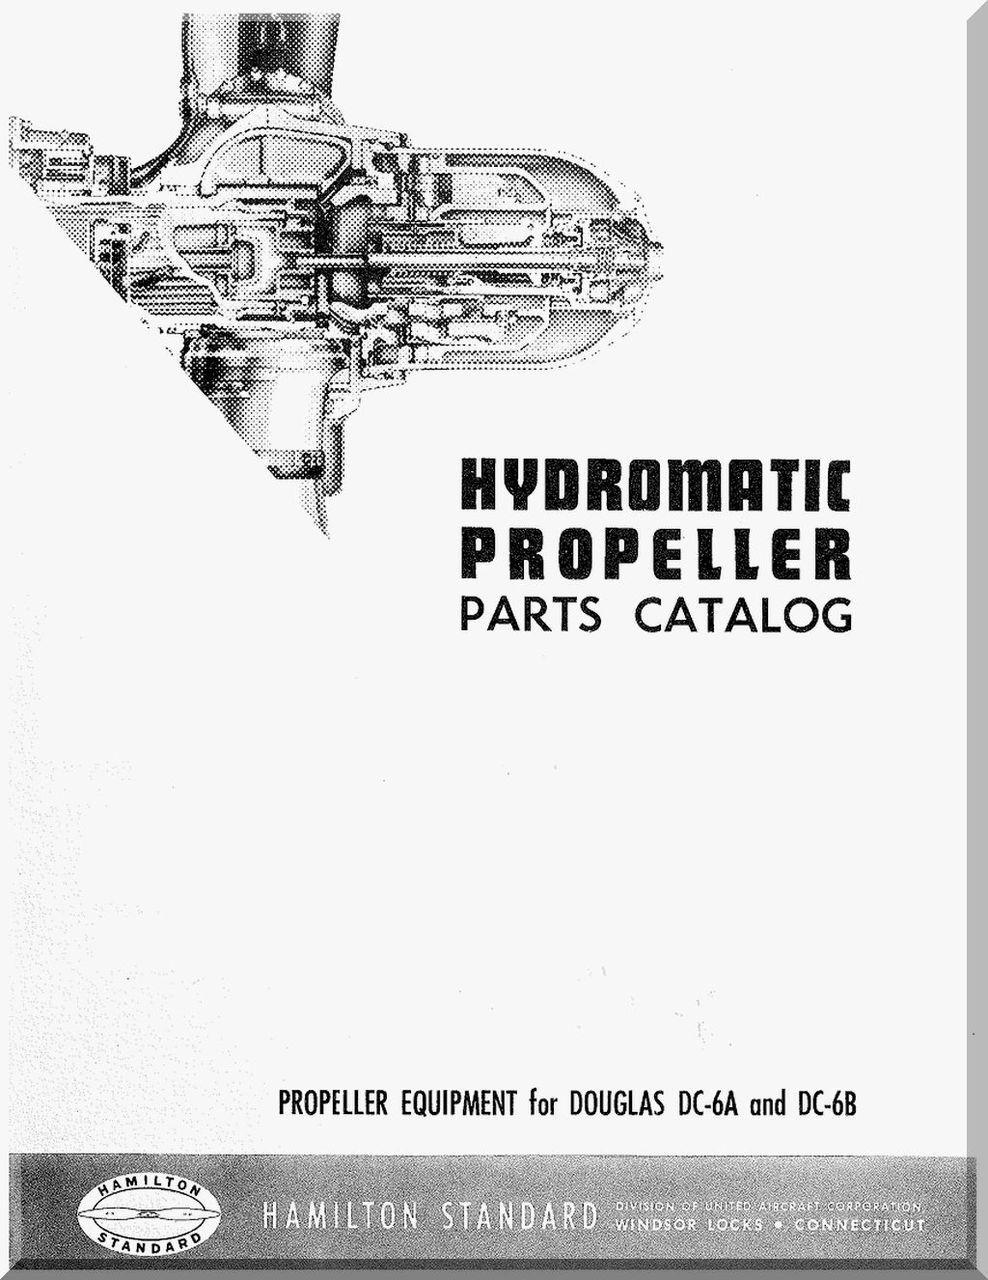 Hamilton Standard Hydromantic Aircraft Propeller Parts Manual